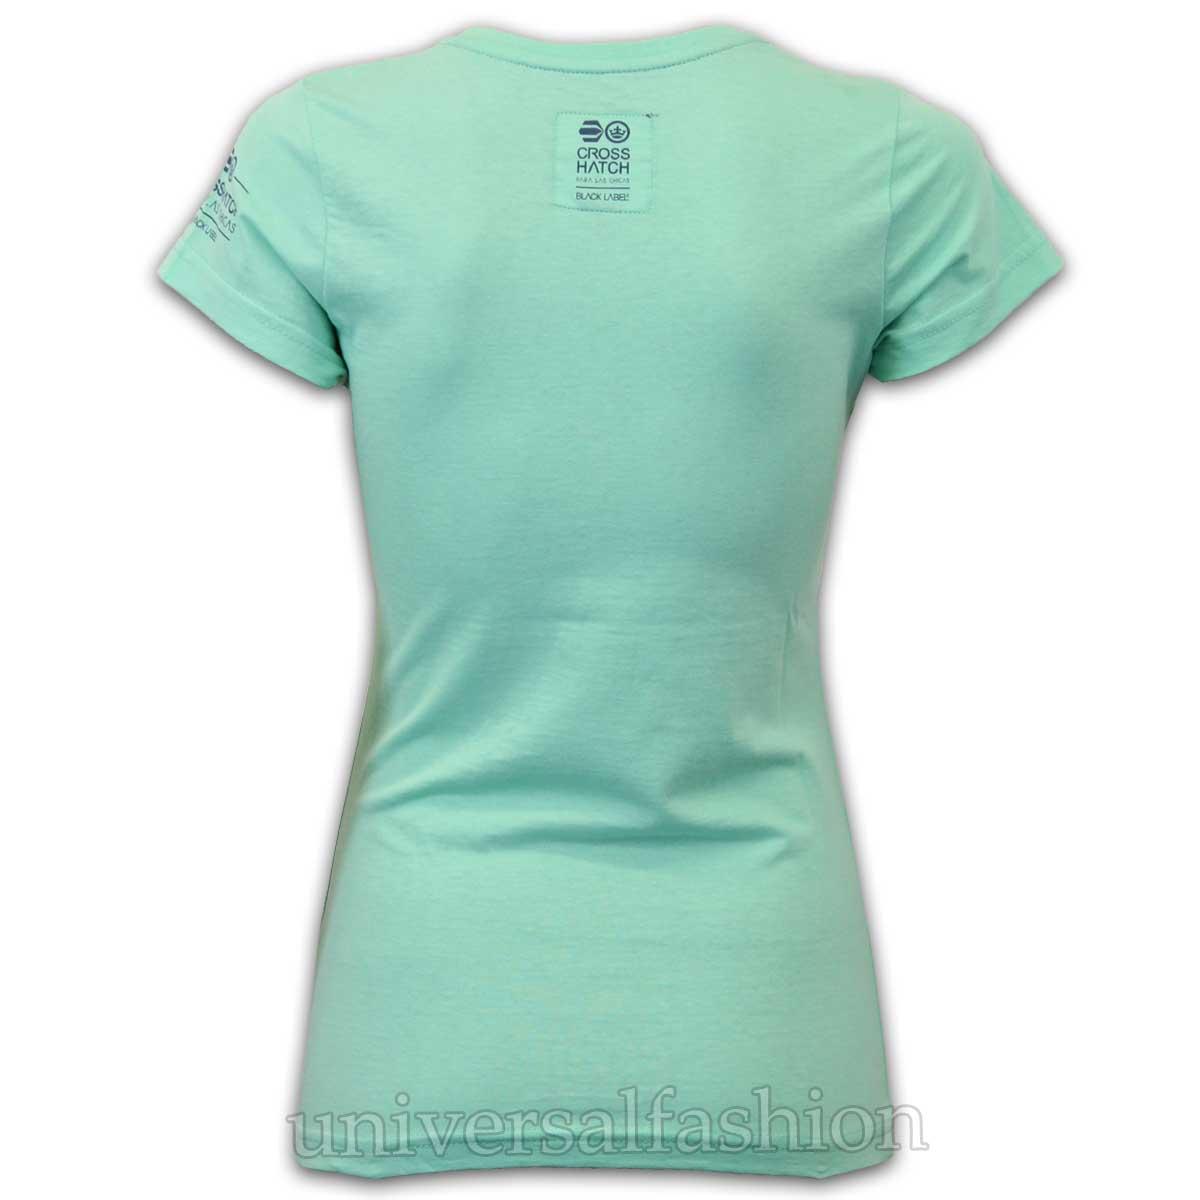 Ladies-T-Shirt-Crosshatch-Womens-Top-Crew-Neck-Print-Cap-Sleeved-Casual-Summer thumbnail 3